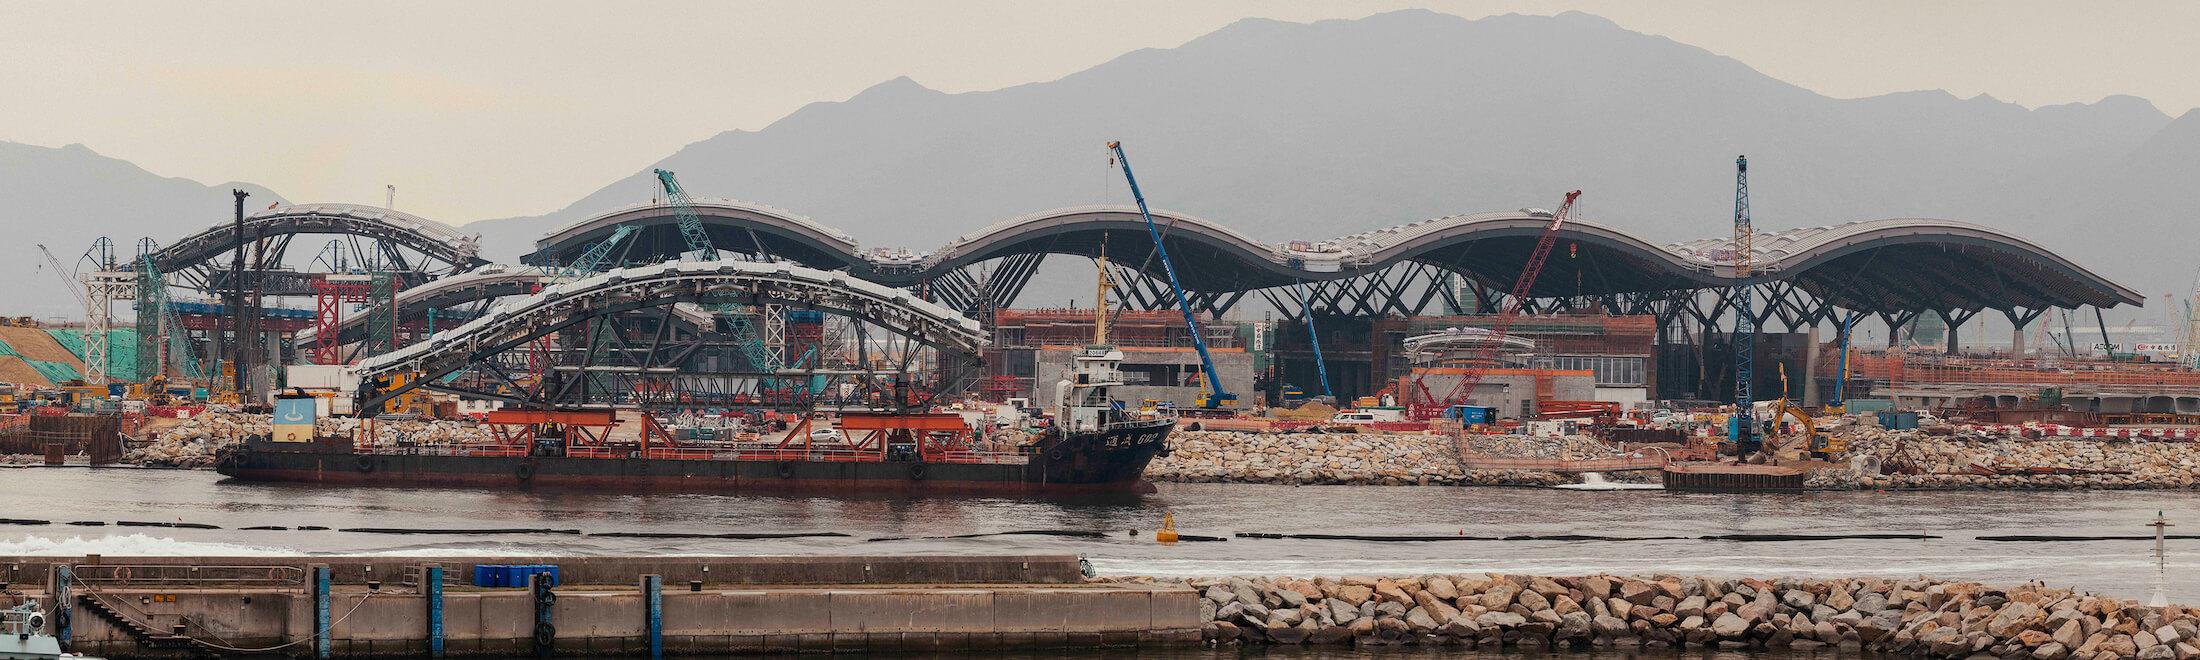 Passenger Crossing Boundary Facility, Hong Kong Macau Zhuhai Bridge